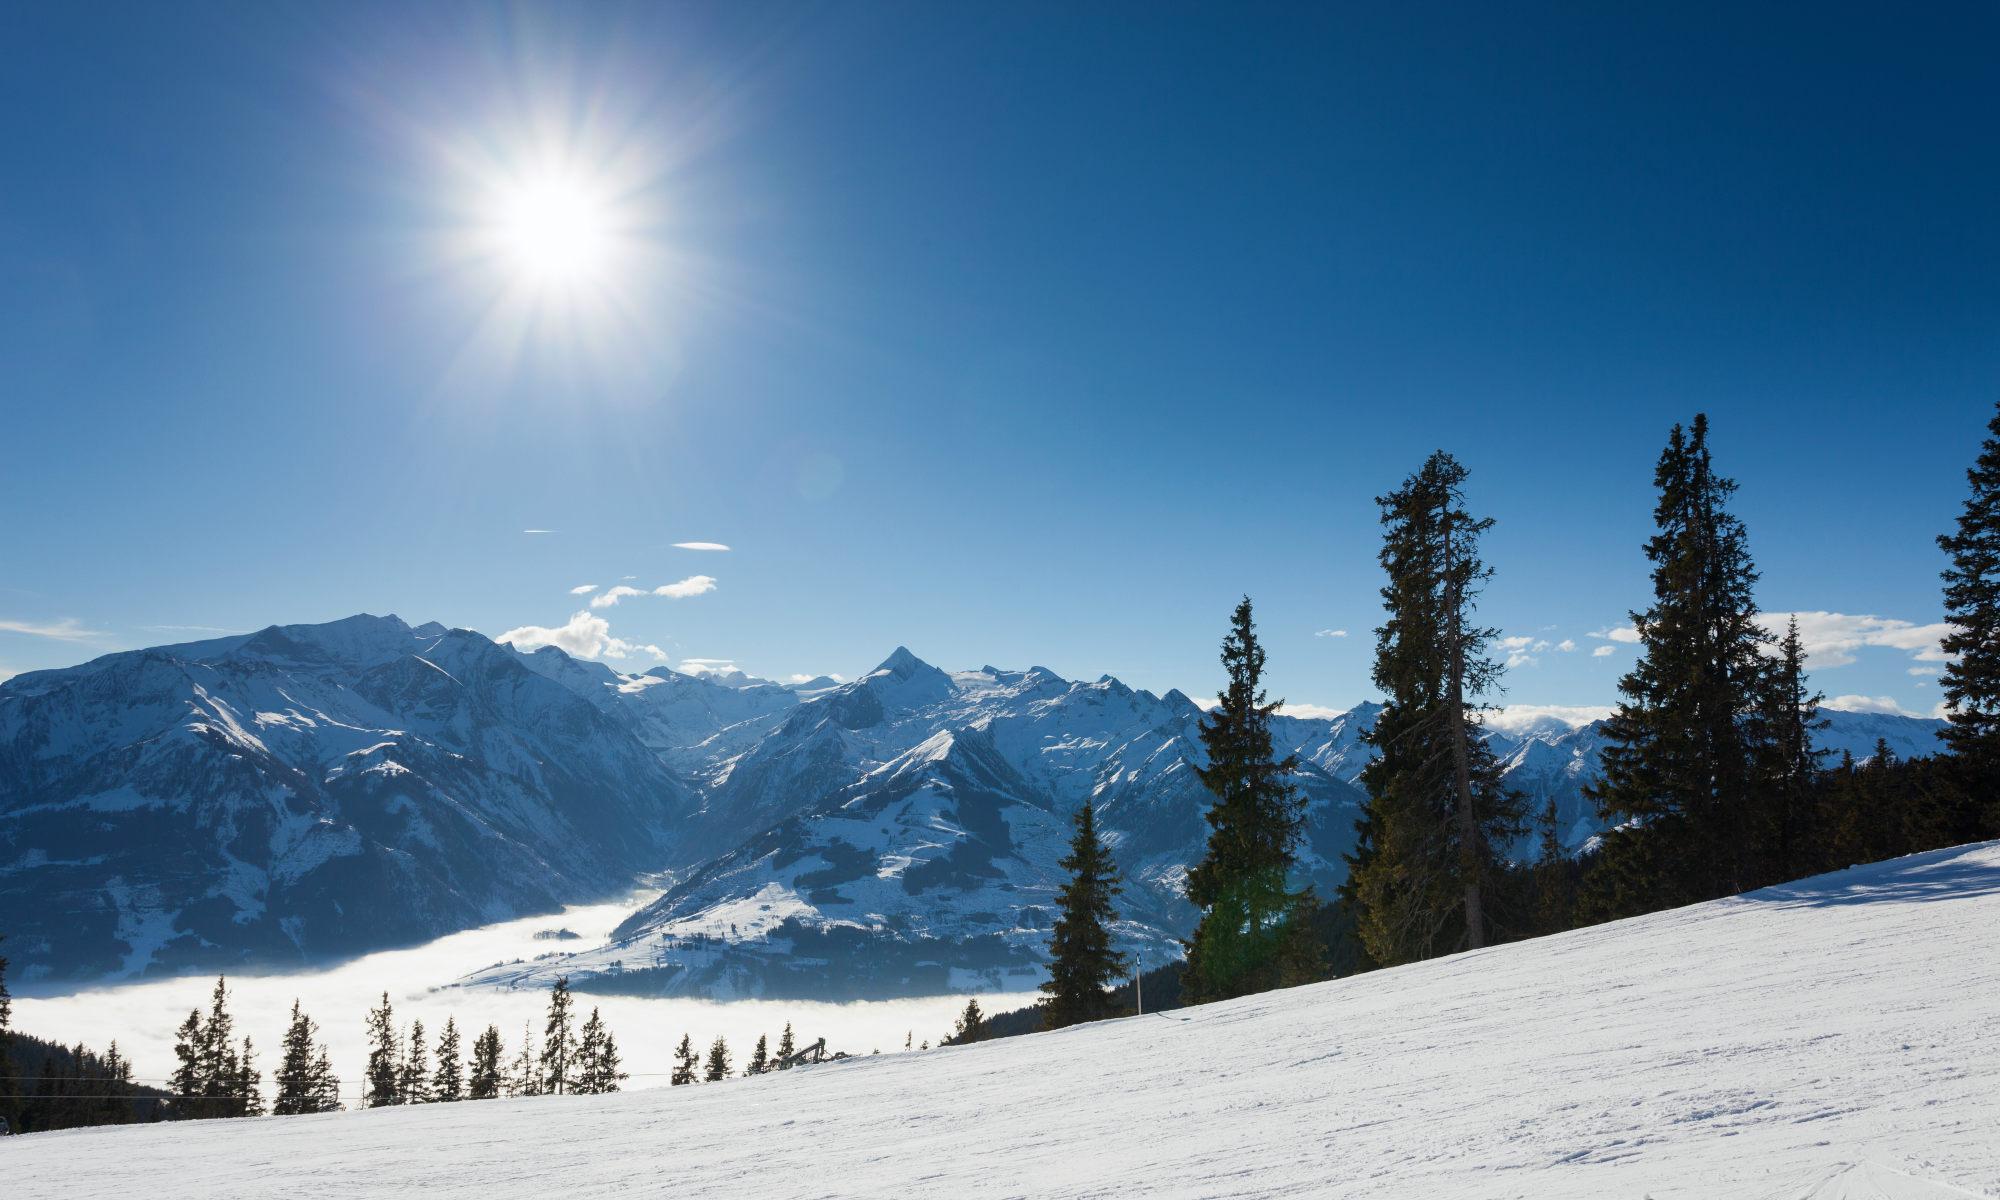 Panoramic view over the surrounding mountains of the ski resort Kaprun.